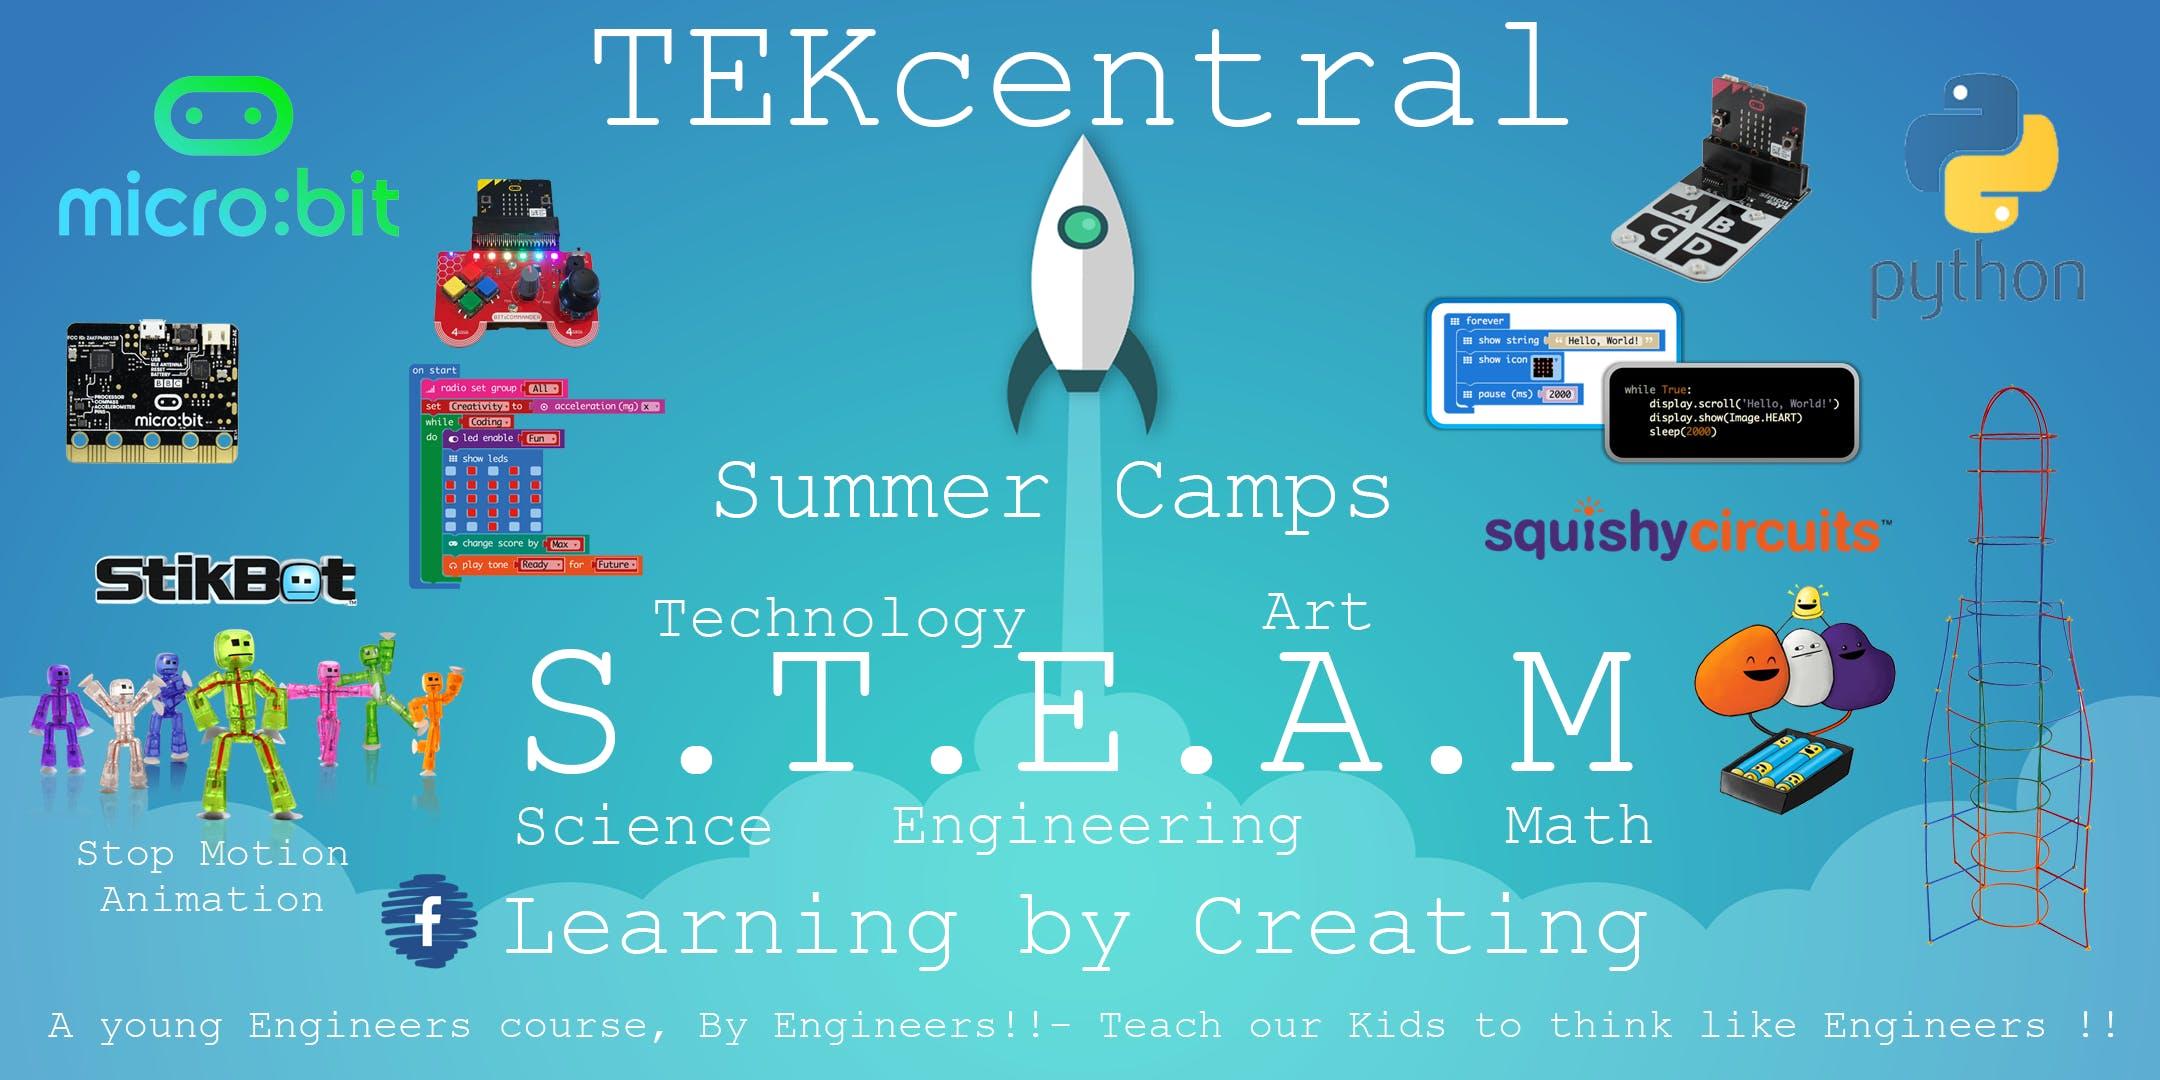 TEKcentral Coding & Technology Summer Camp - Enniscorthy